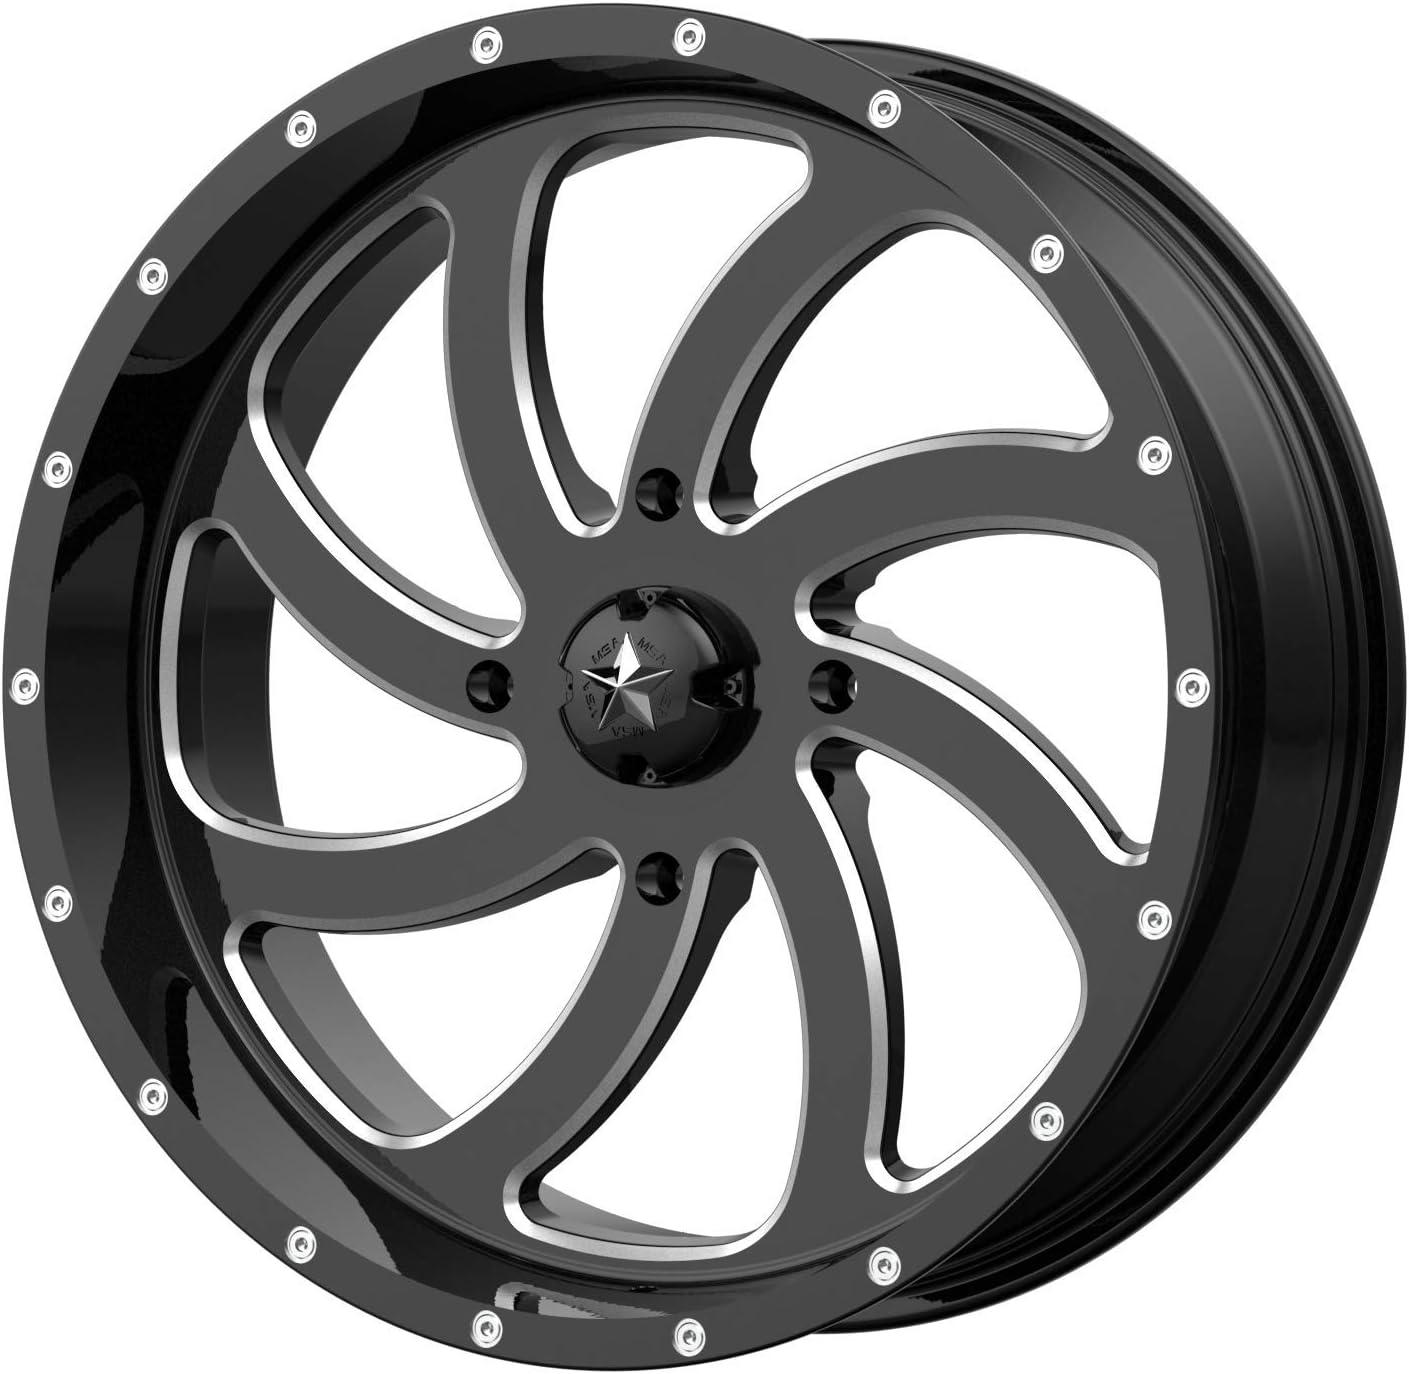 MSA M36 Switch Max 60% OFF 18x7 ATV UTV Wheel +0mm - Milled 156 M36-018 Rare 4